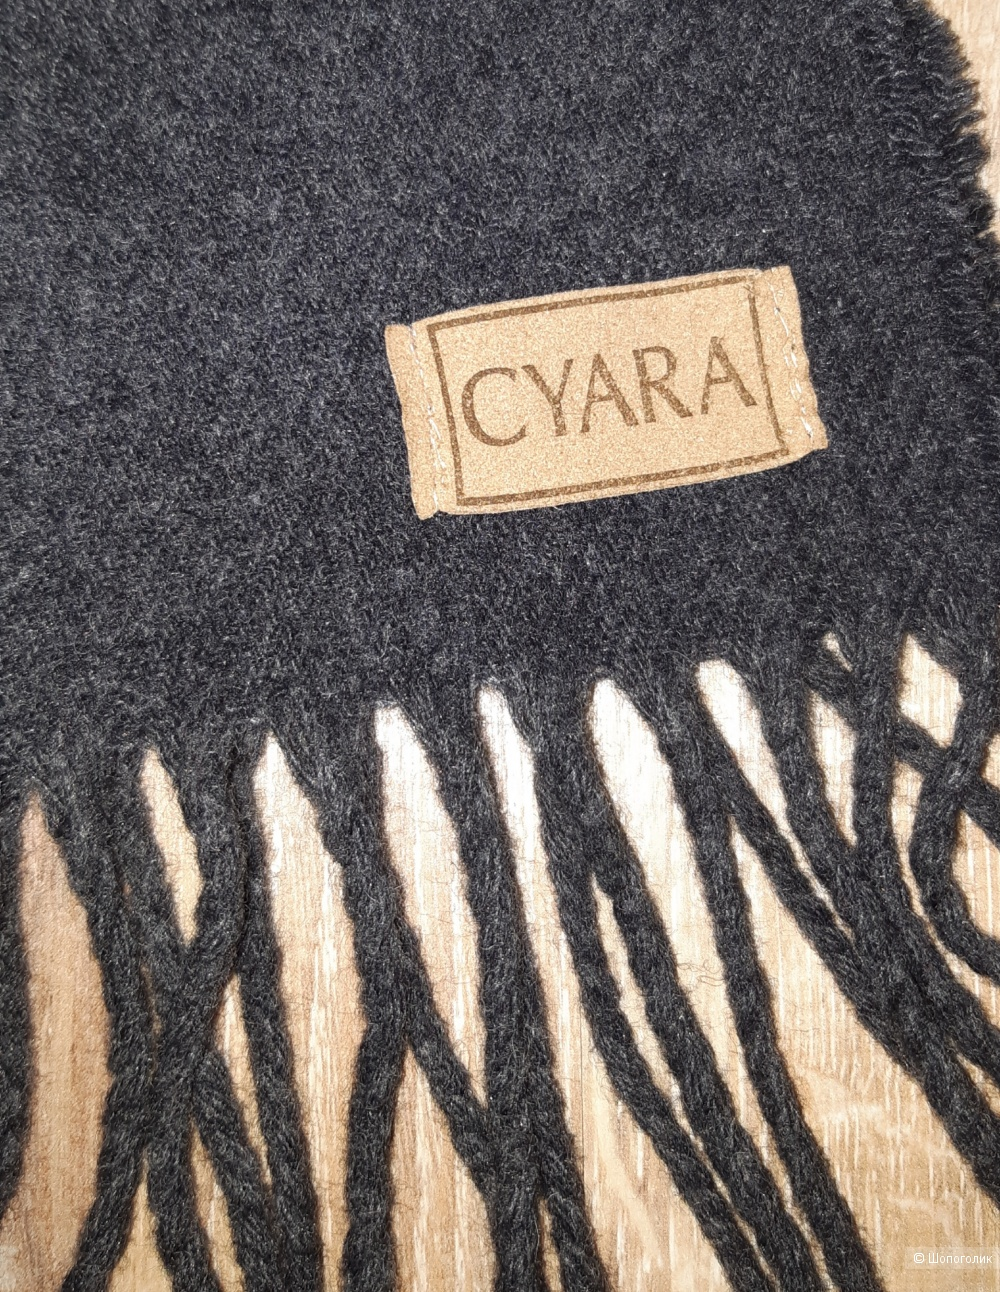 Шерстяной палантин cyara, размер 56*180